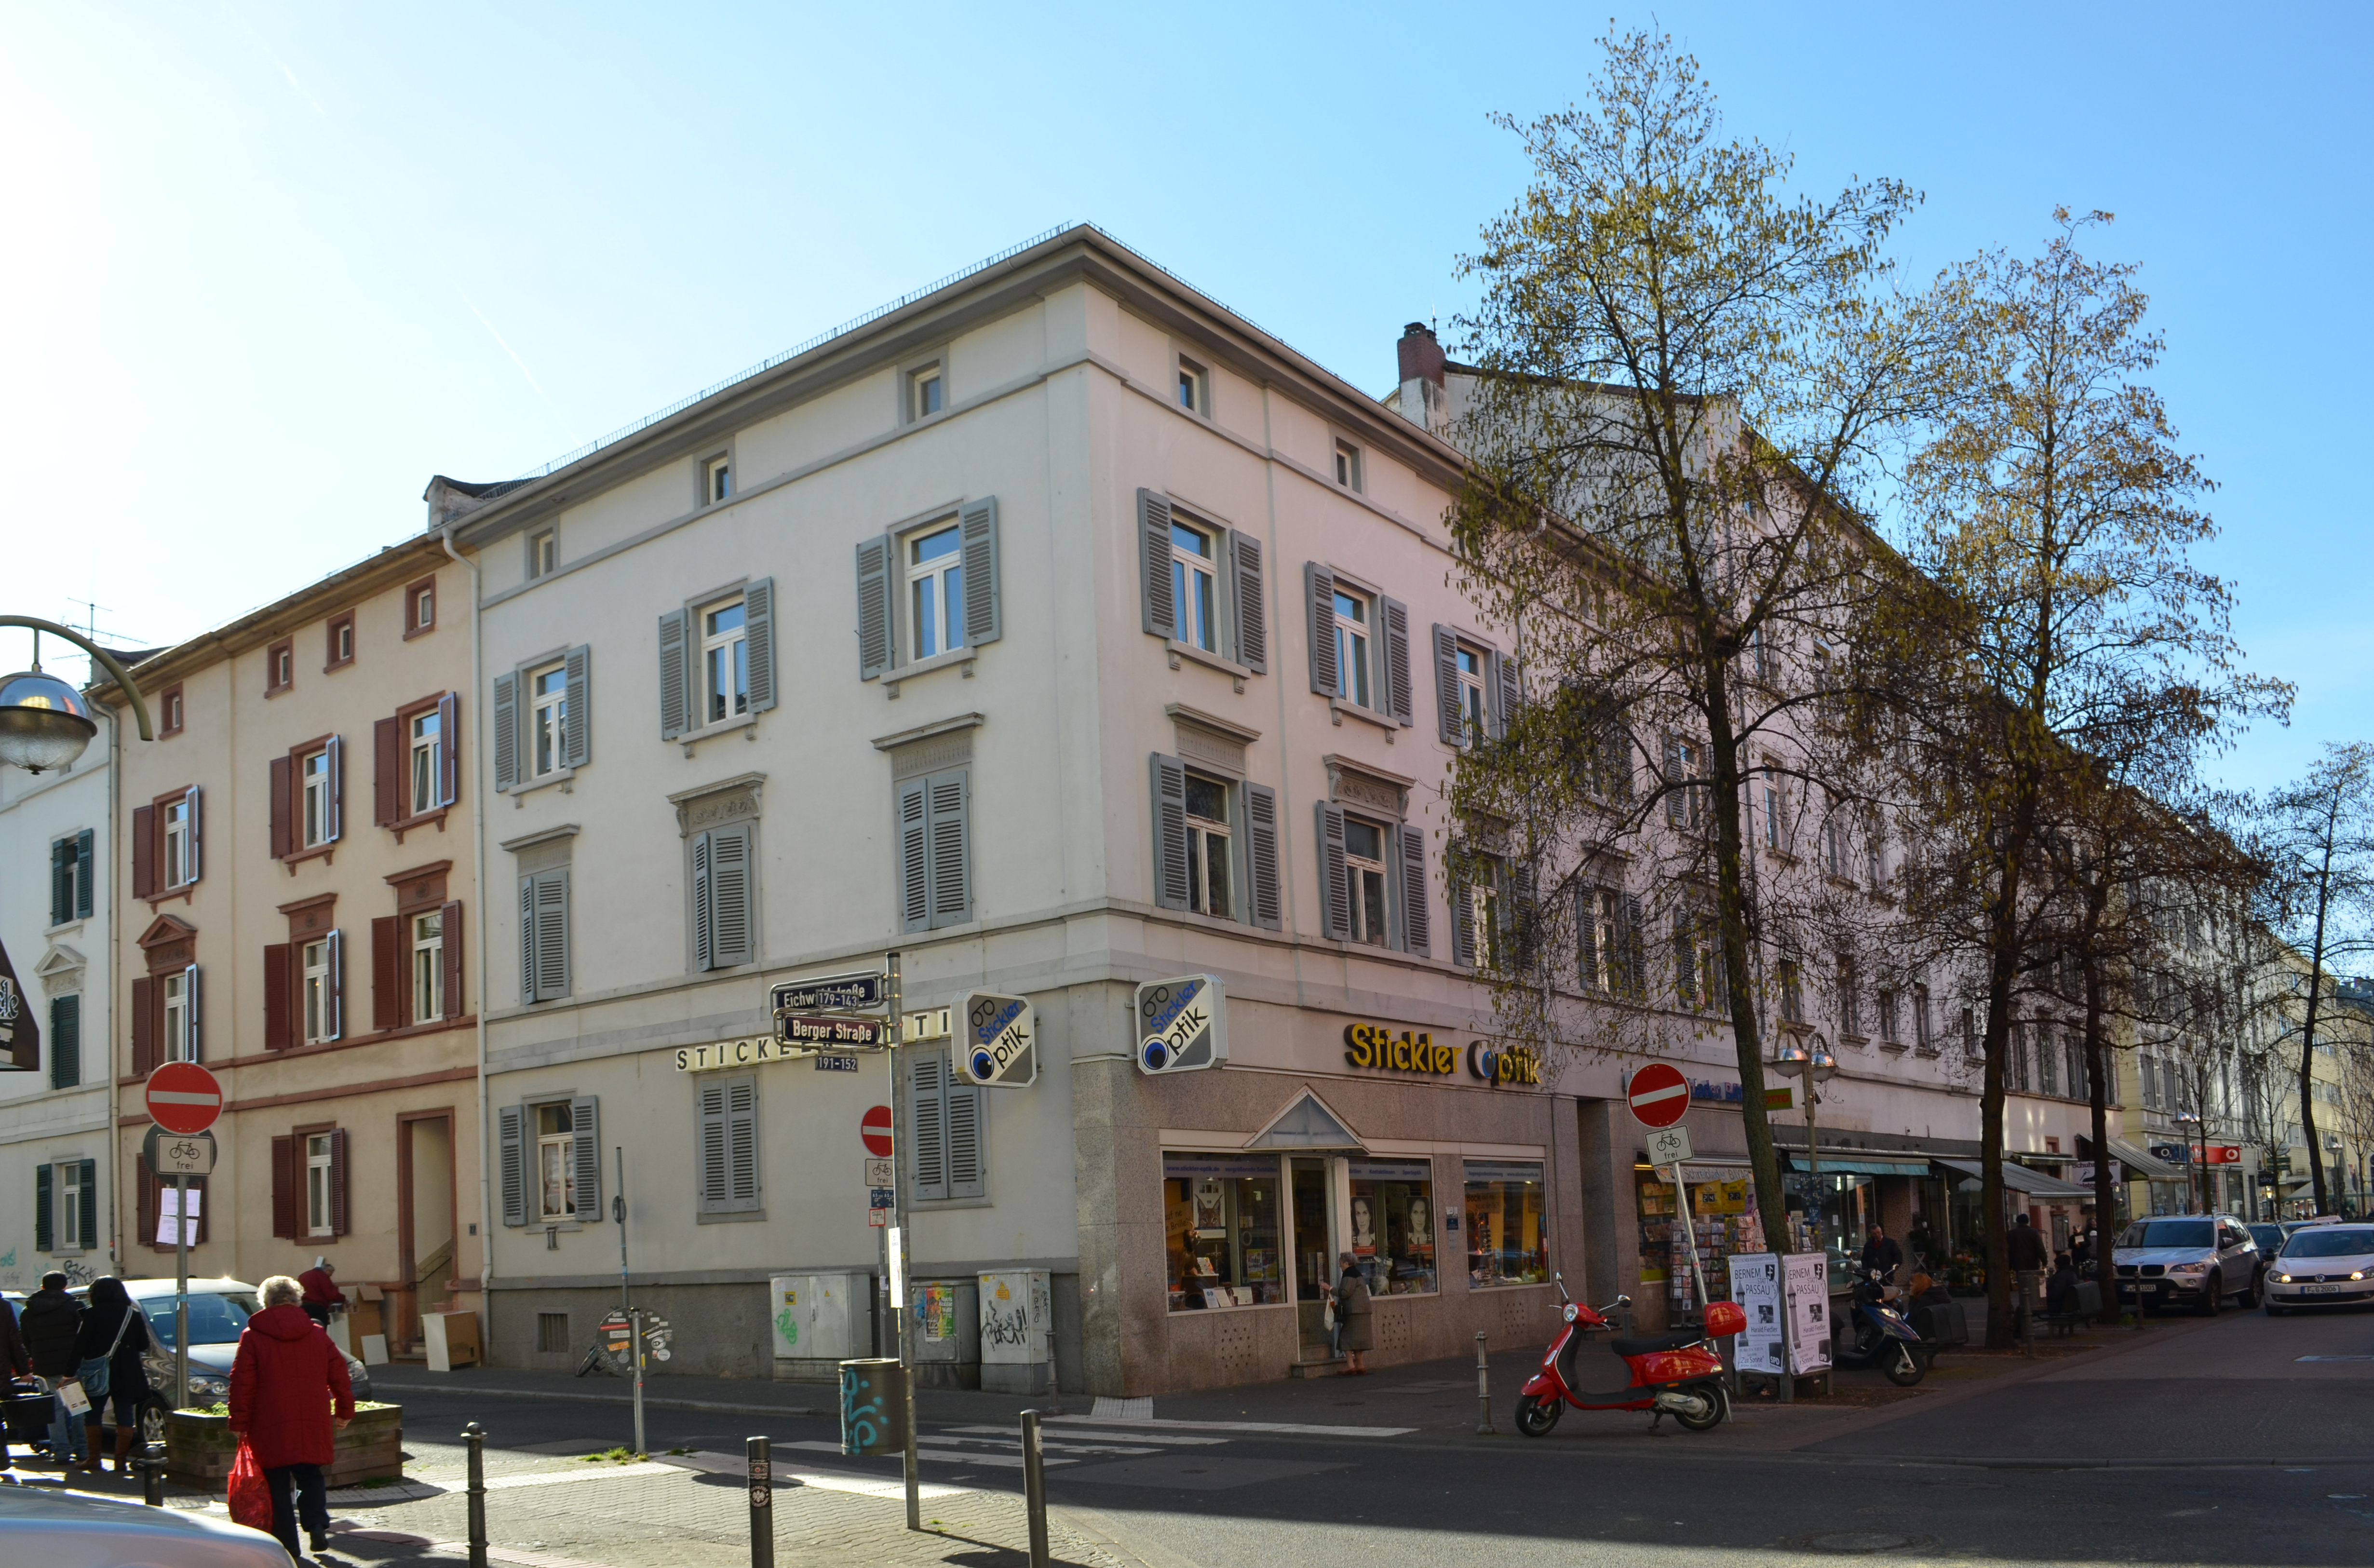 nopeus dating Frankfurt Berger Straße